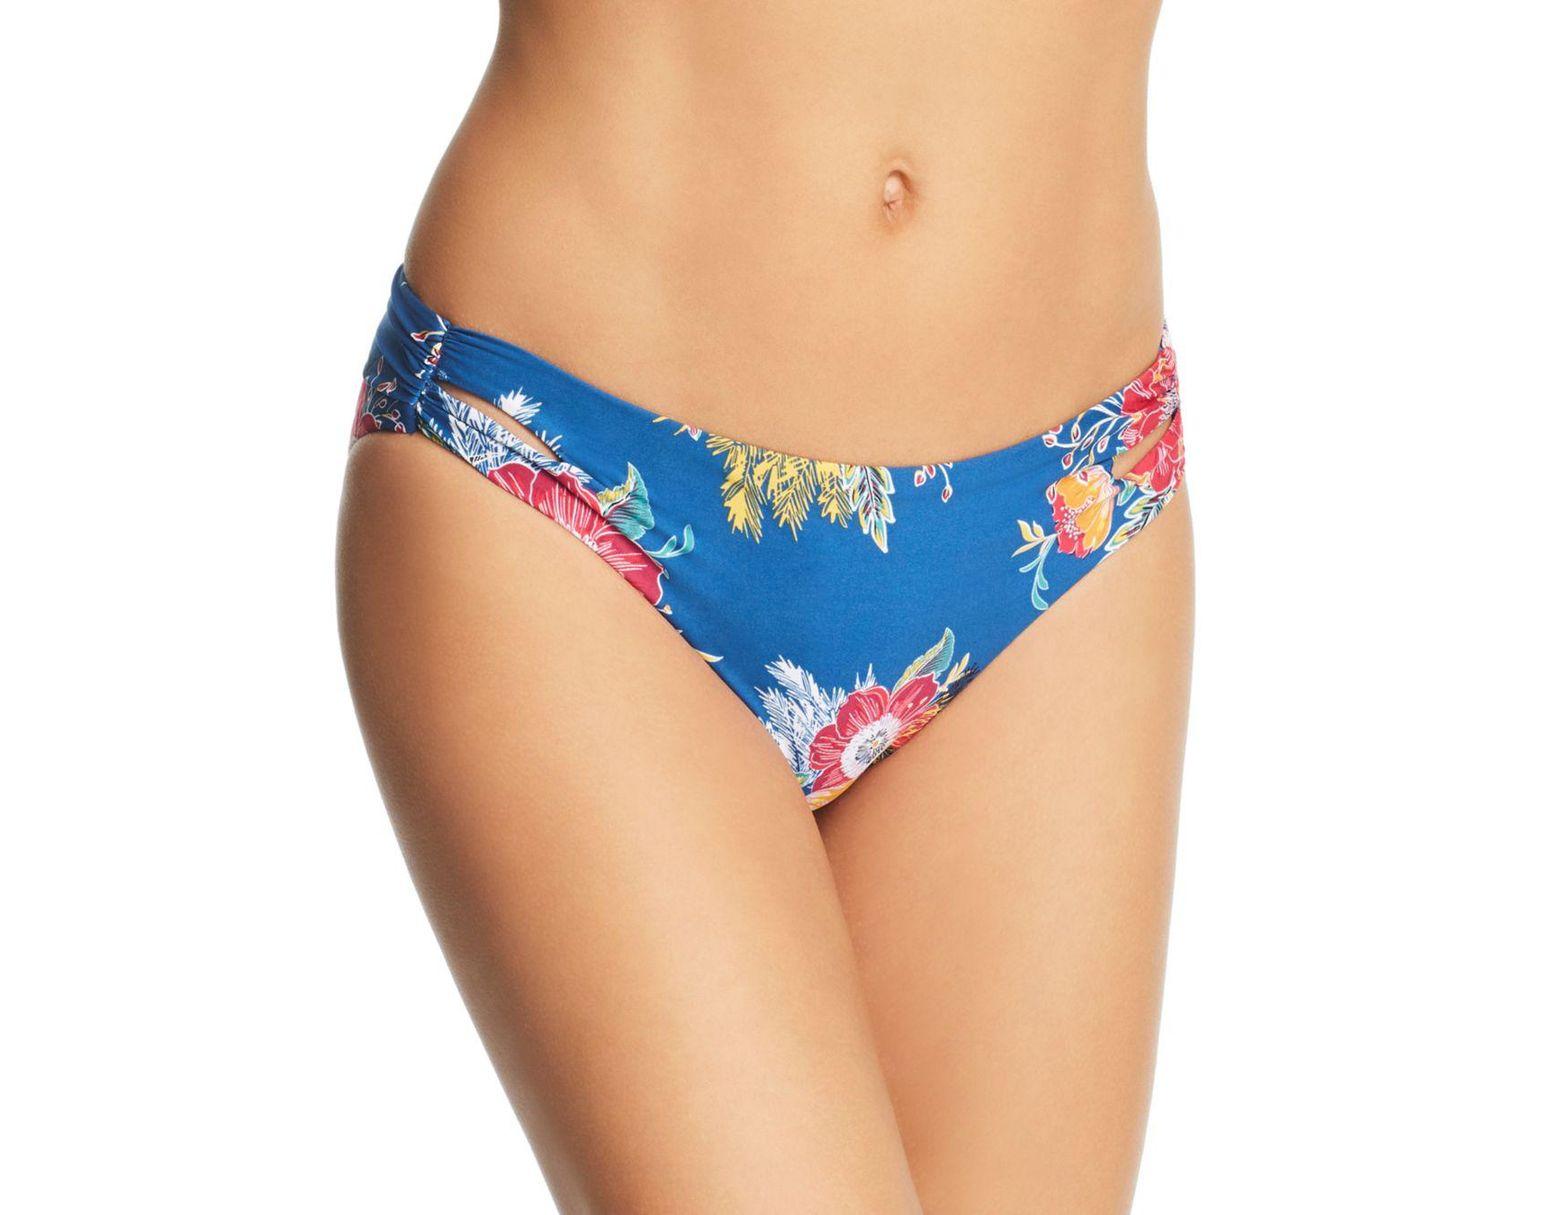 e9b91382c1 Women's Blue Over The Moon Bikini Bottom